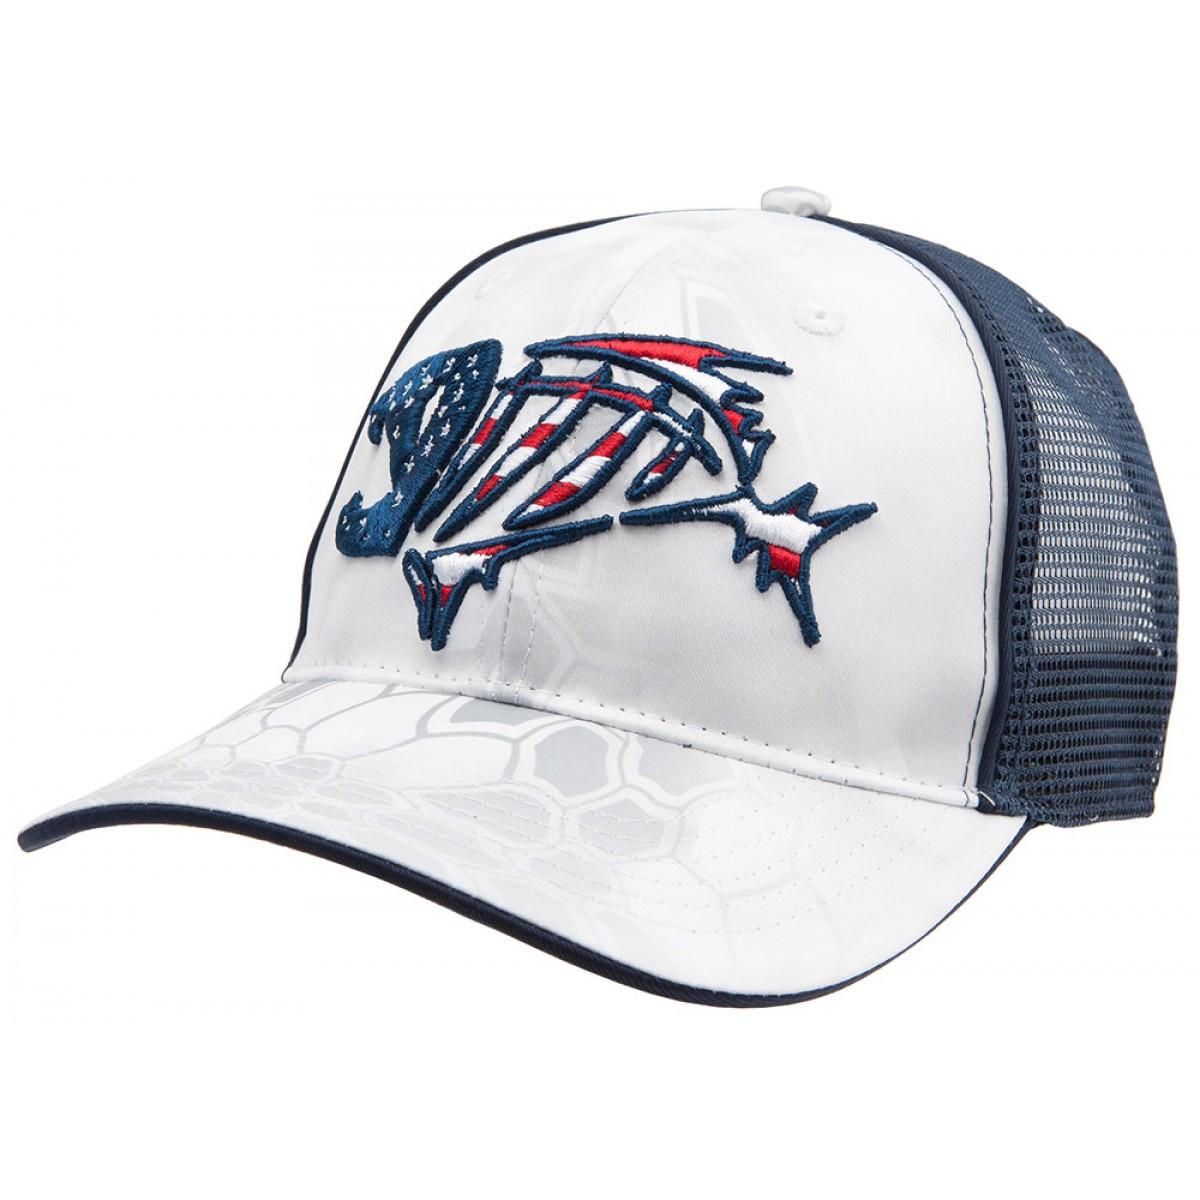 5a1da69a14a G Loomis Hats and Visors